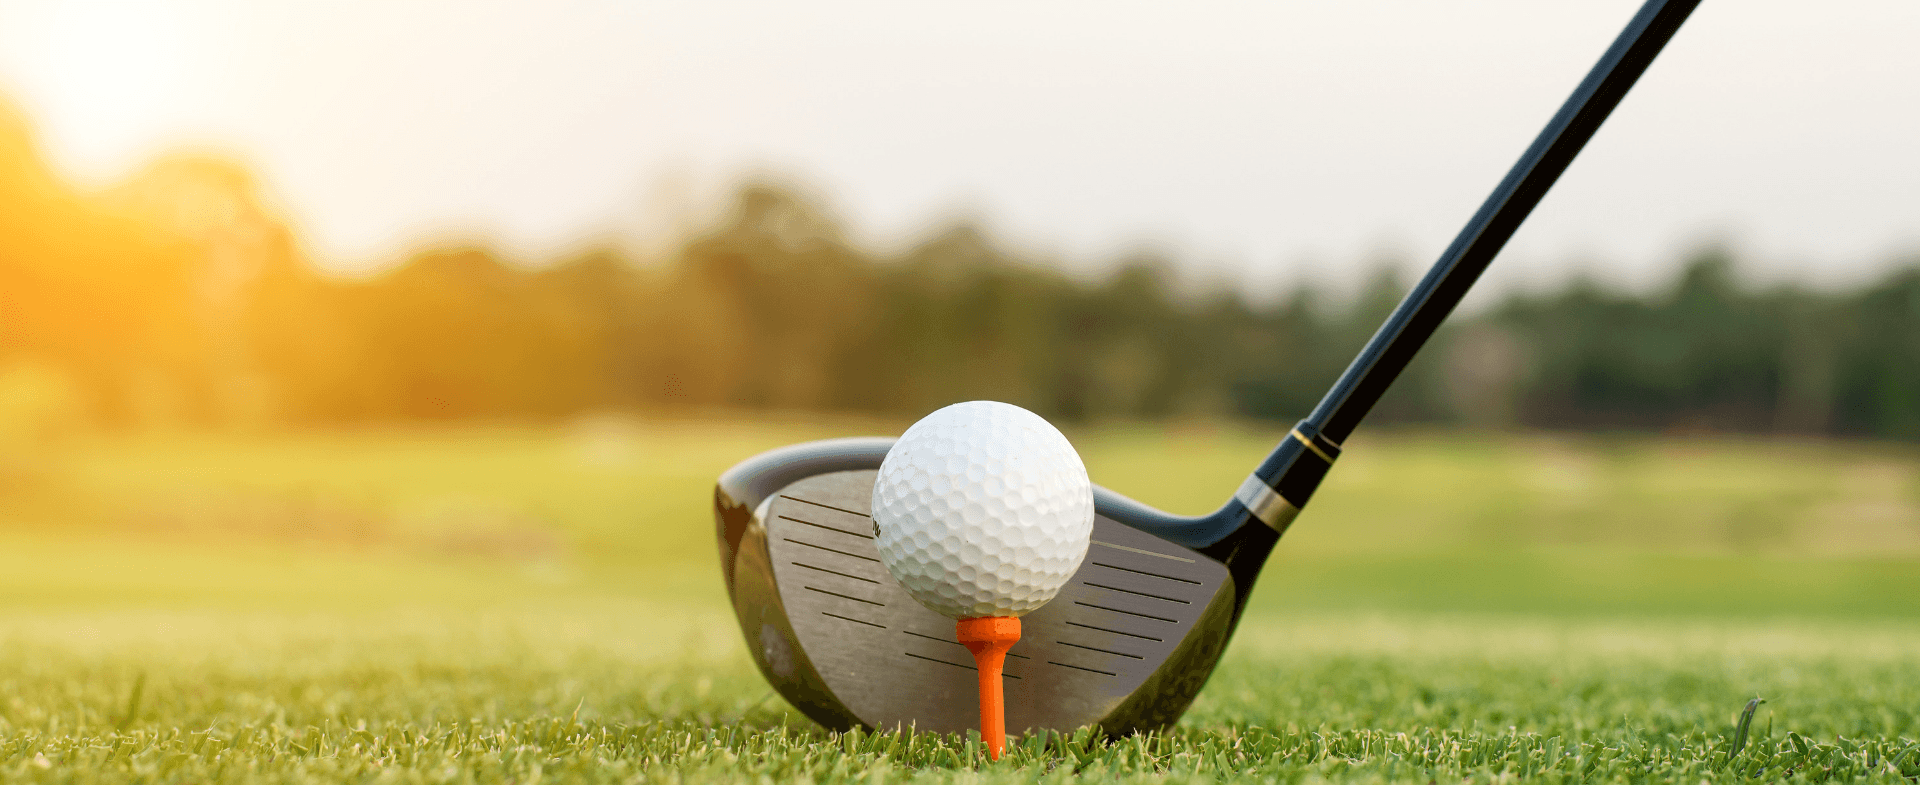 Golf Ball on Tee on Grass